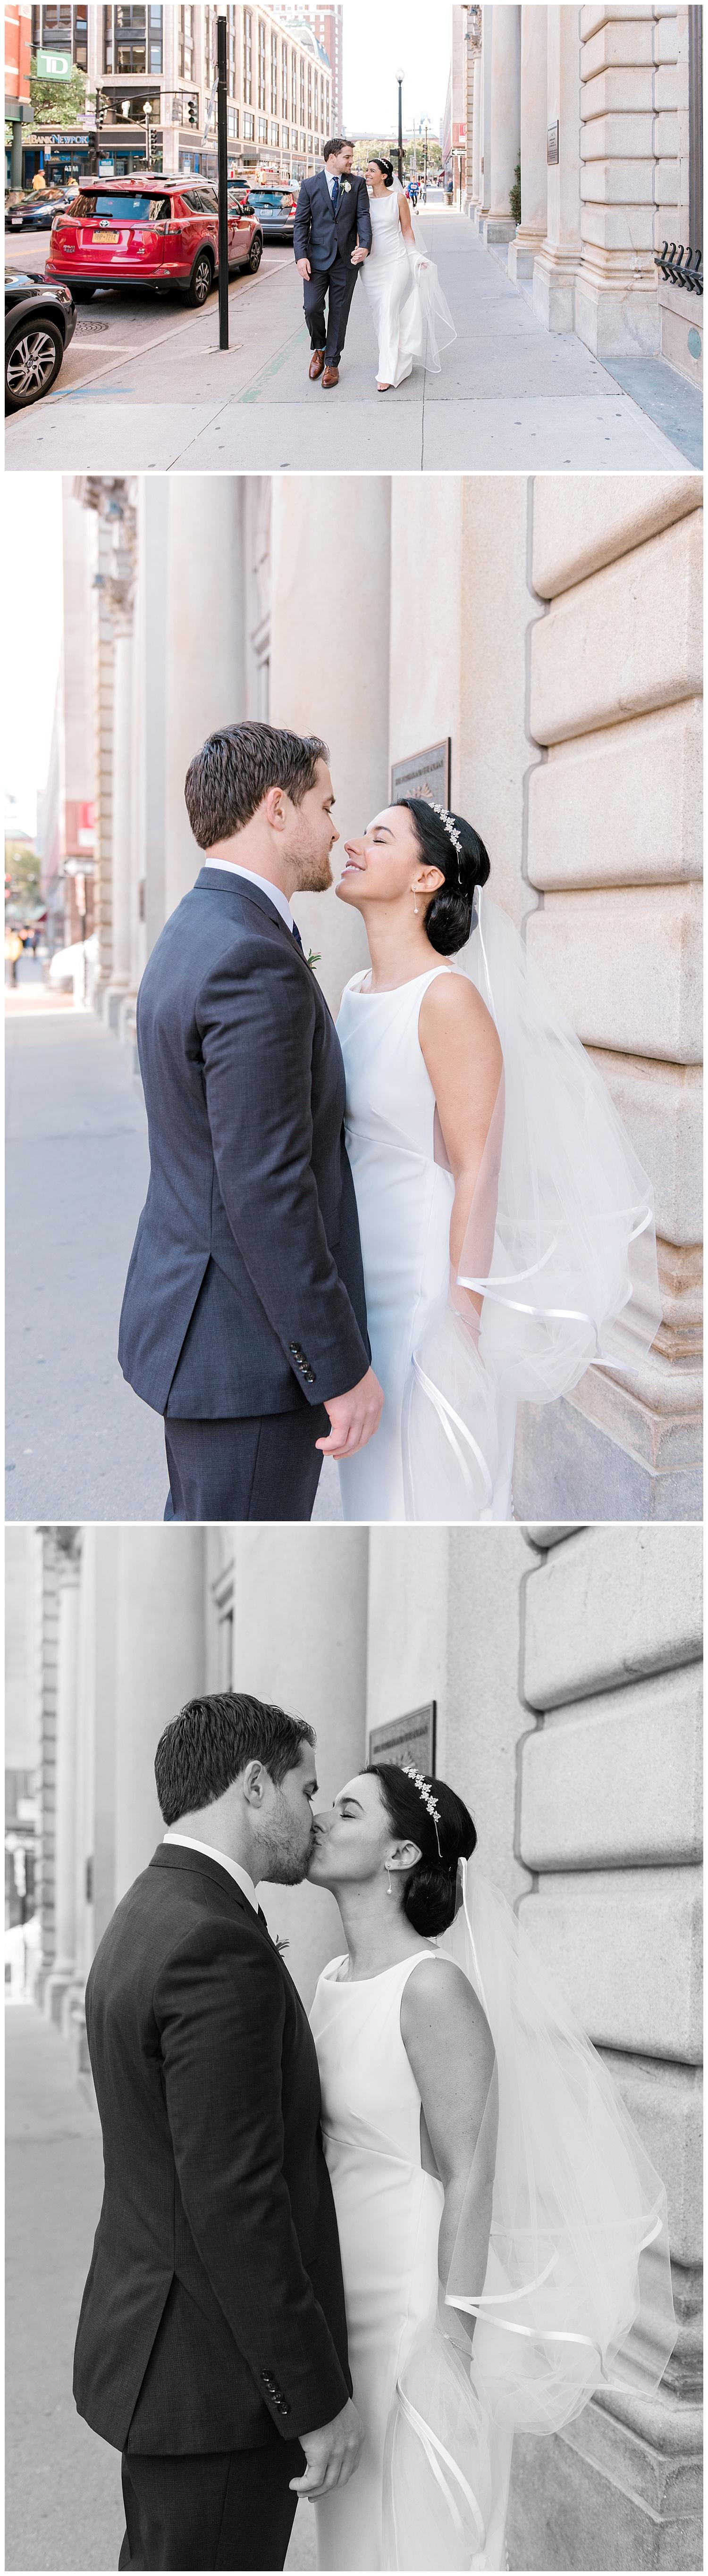 the-dorrance-providence-wedding-photography-october19-photo-22.jpg